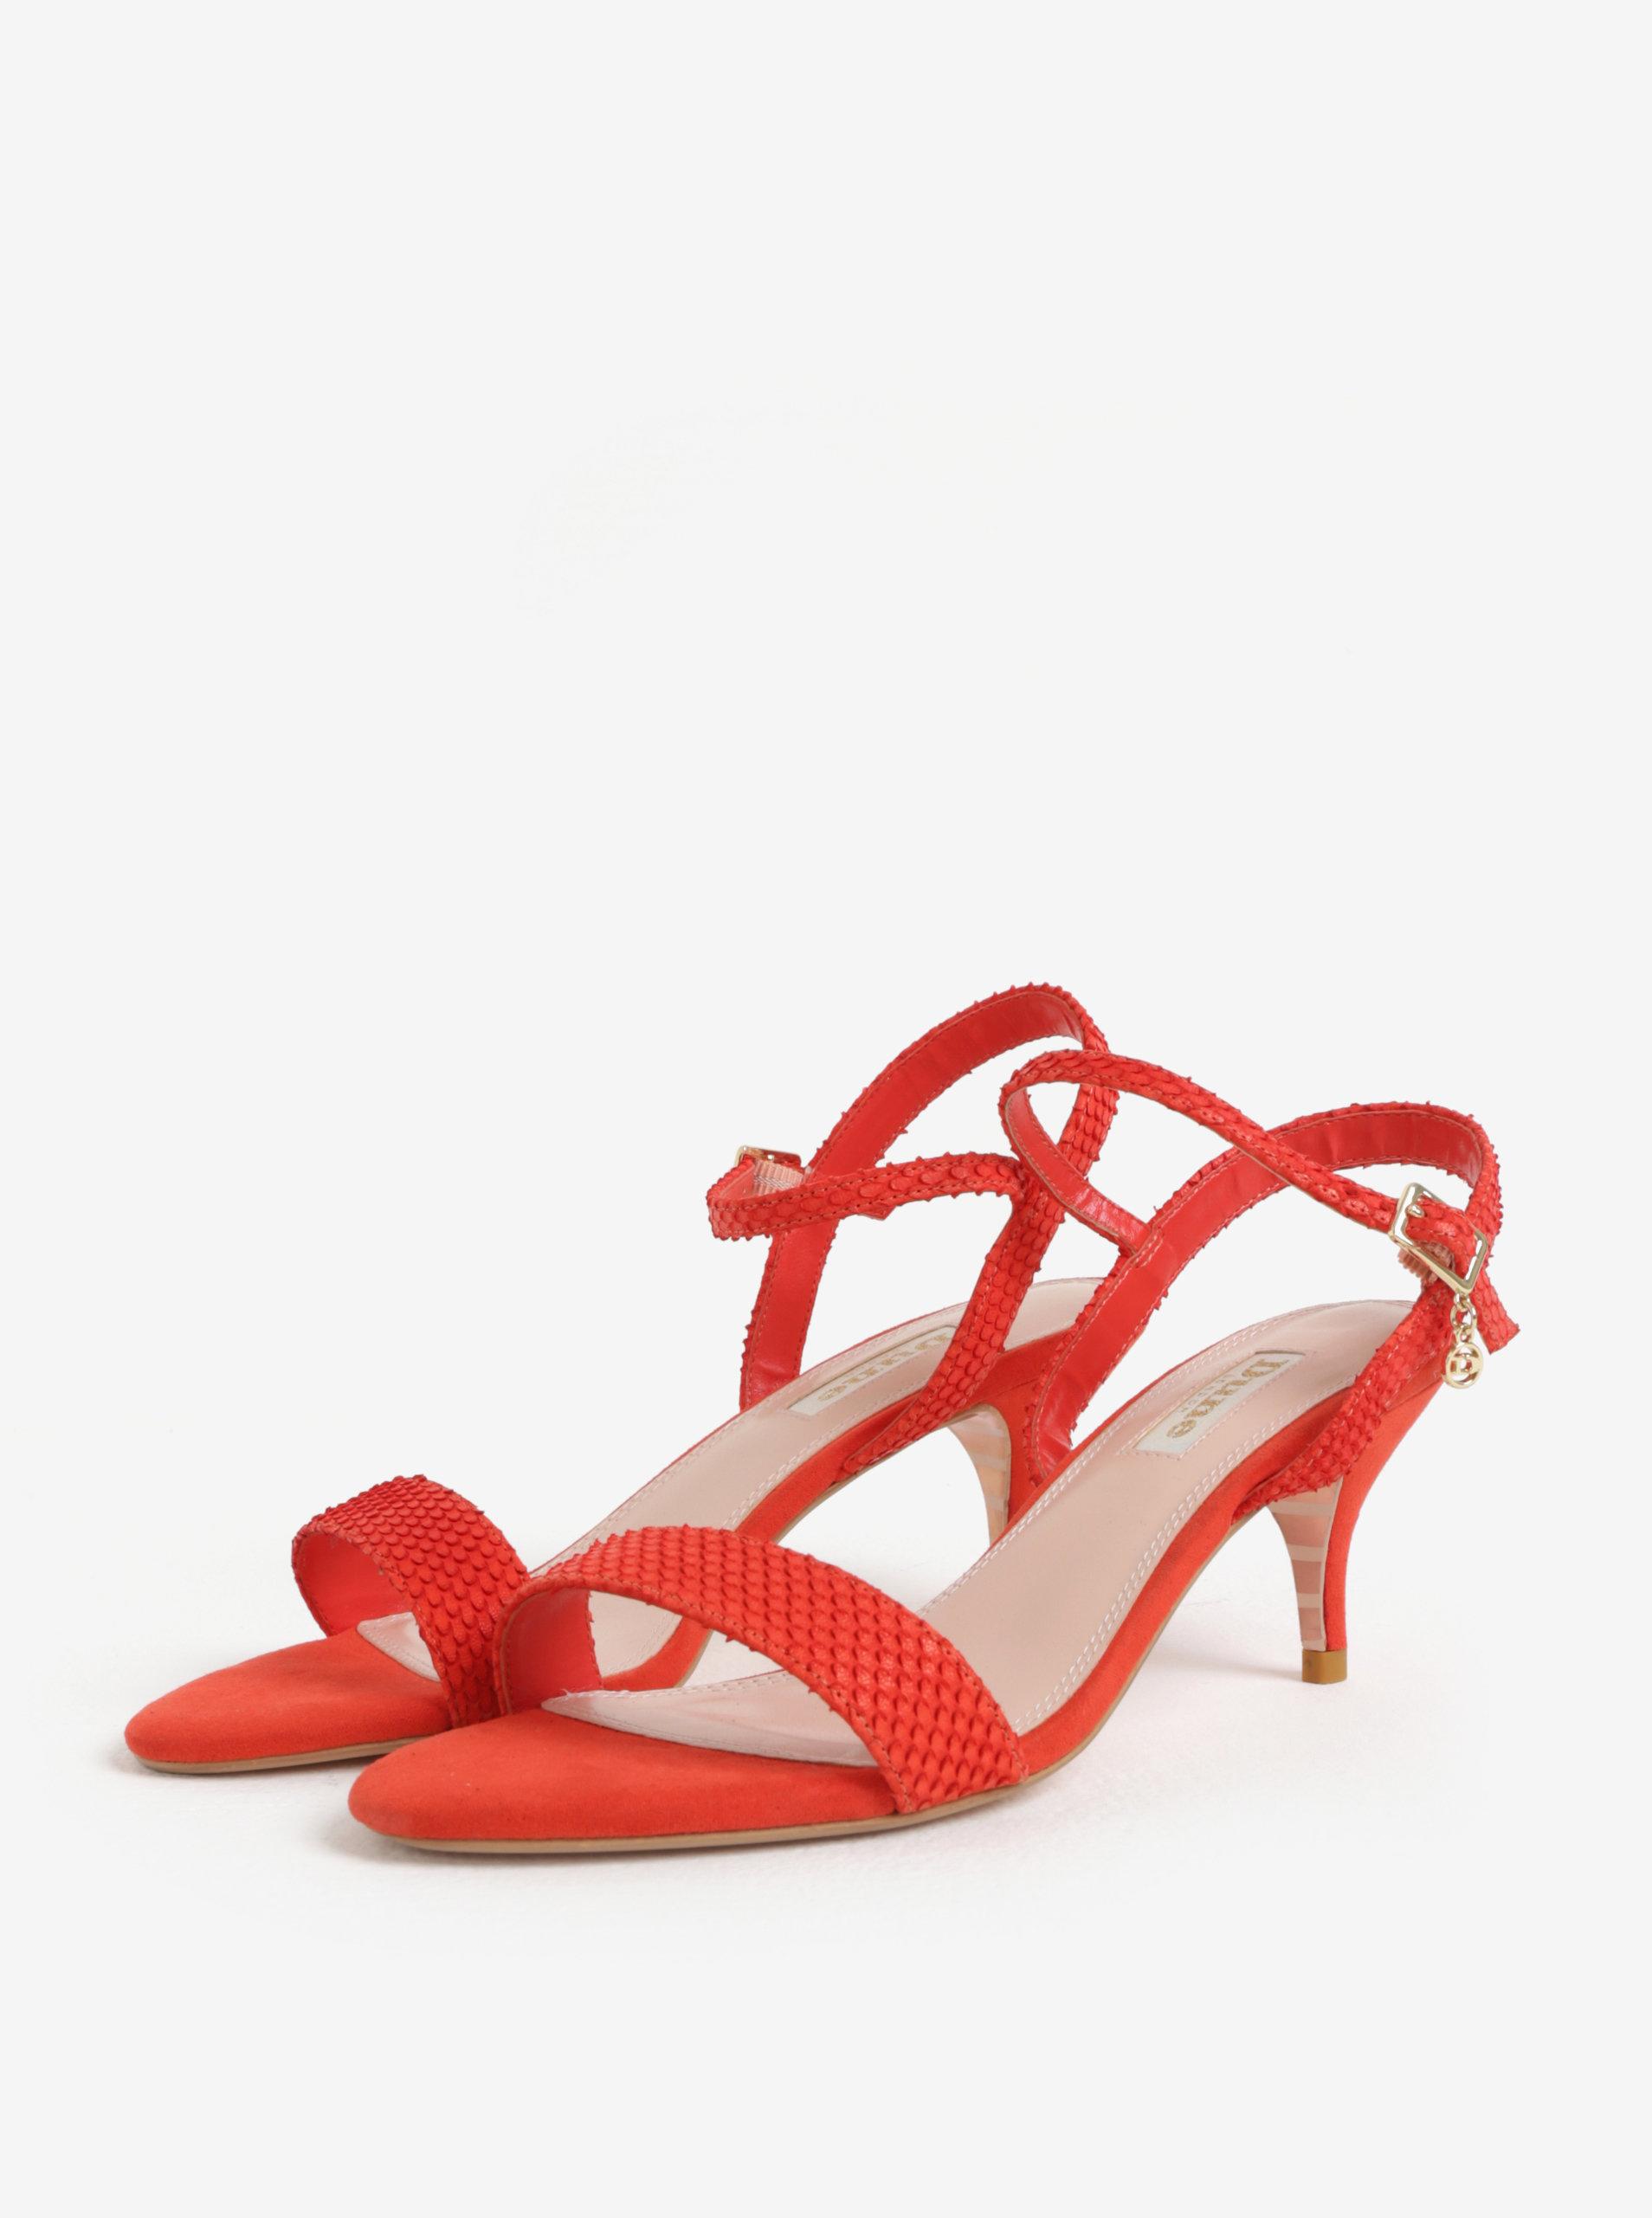 ed7900ffa4361 Červené sandálky na ihlovom podpätku Dune London Monnrow | ZOOT.sk